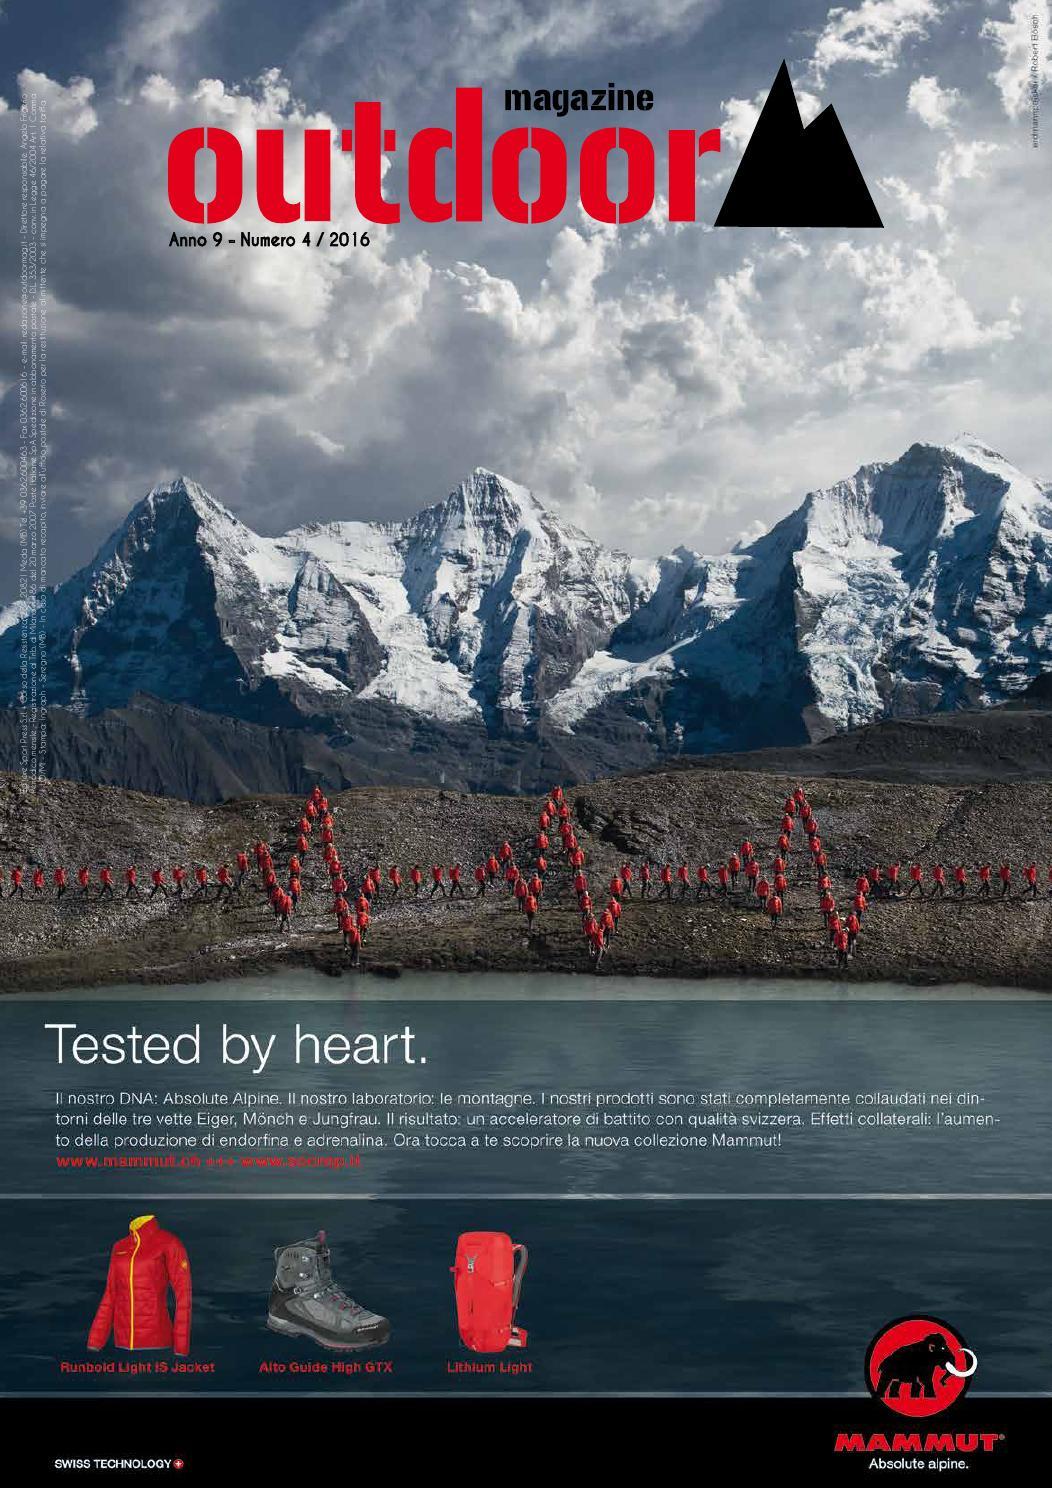 Outdoor Mag 4 2016 by Sport Press - issuu 4bbf77af3164